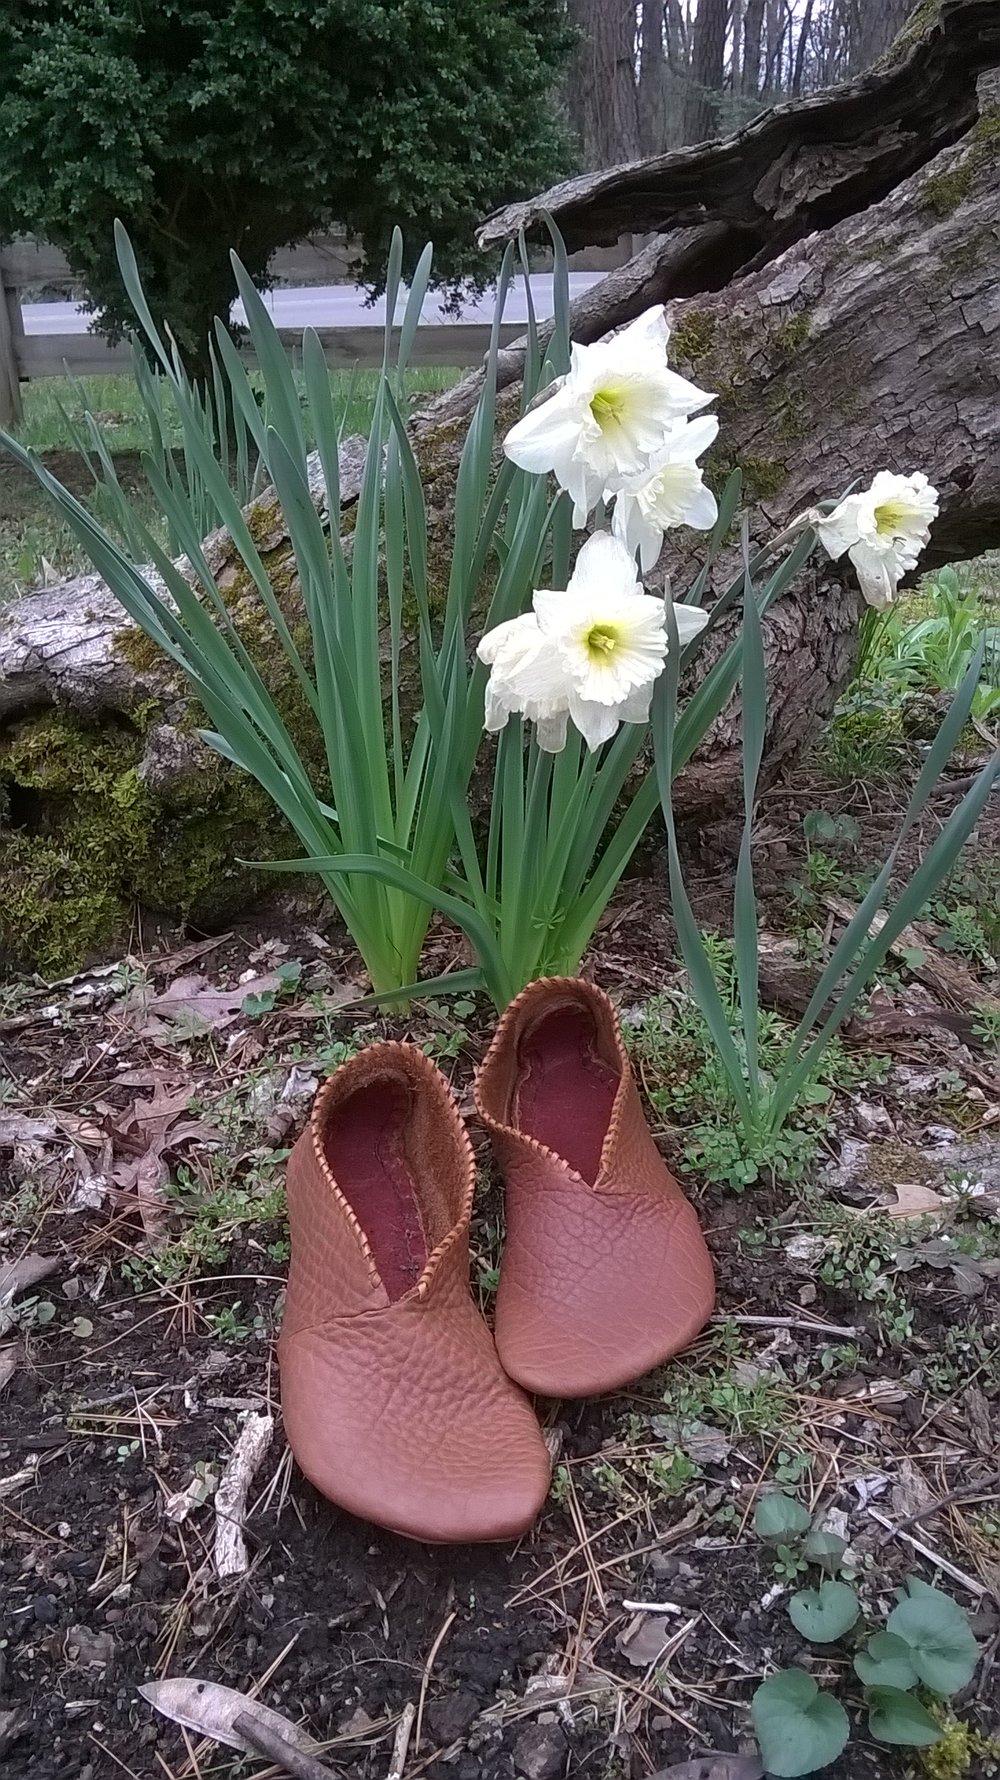 Fairy%20Shoes%201.jpg